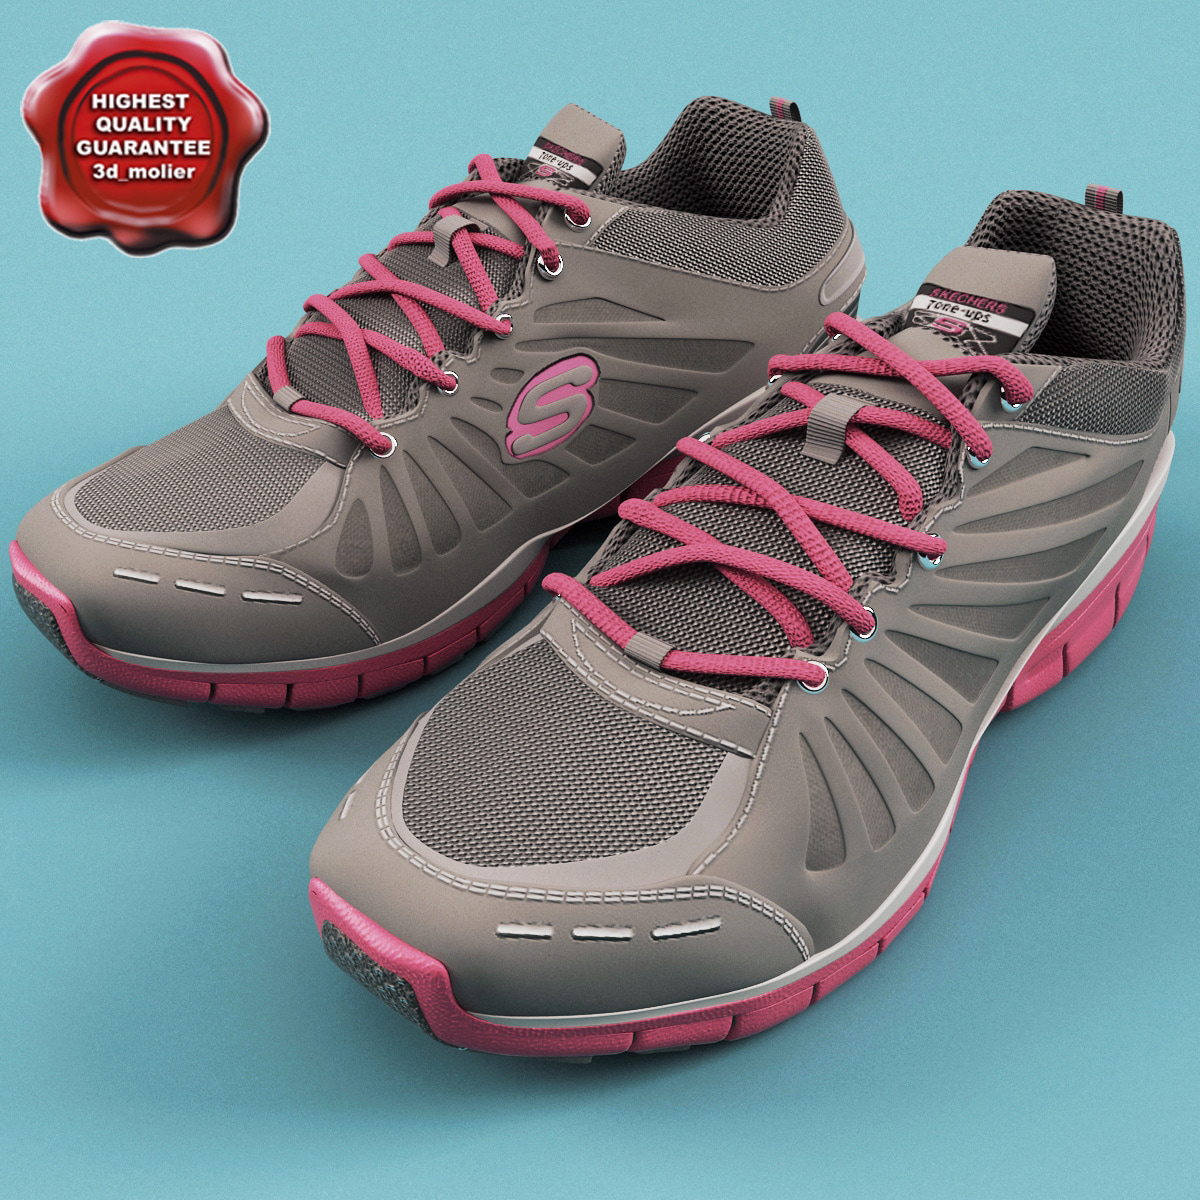 Womens_Skechers_Tone-ups_Run_Shoes_00.jpg